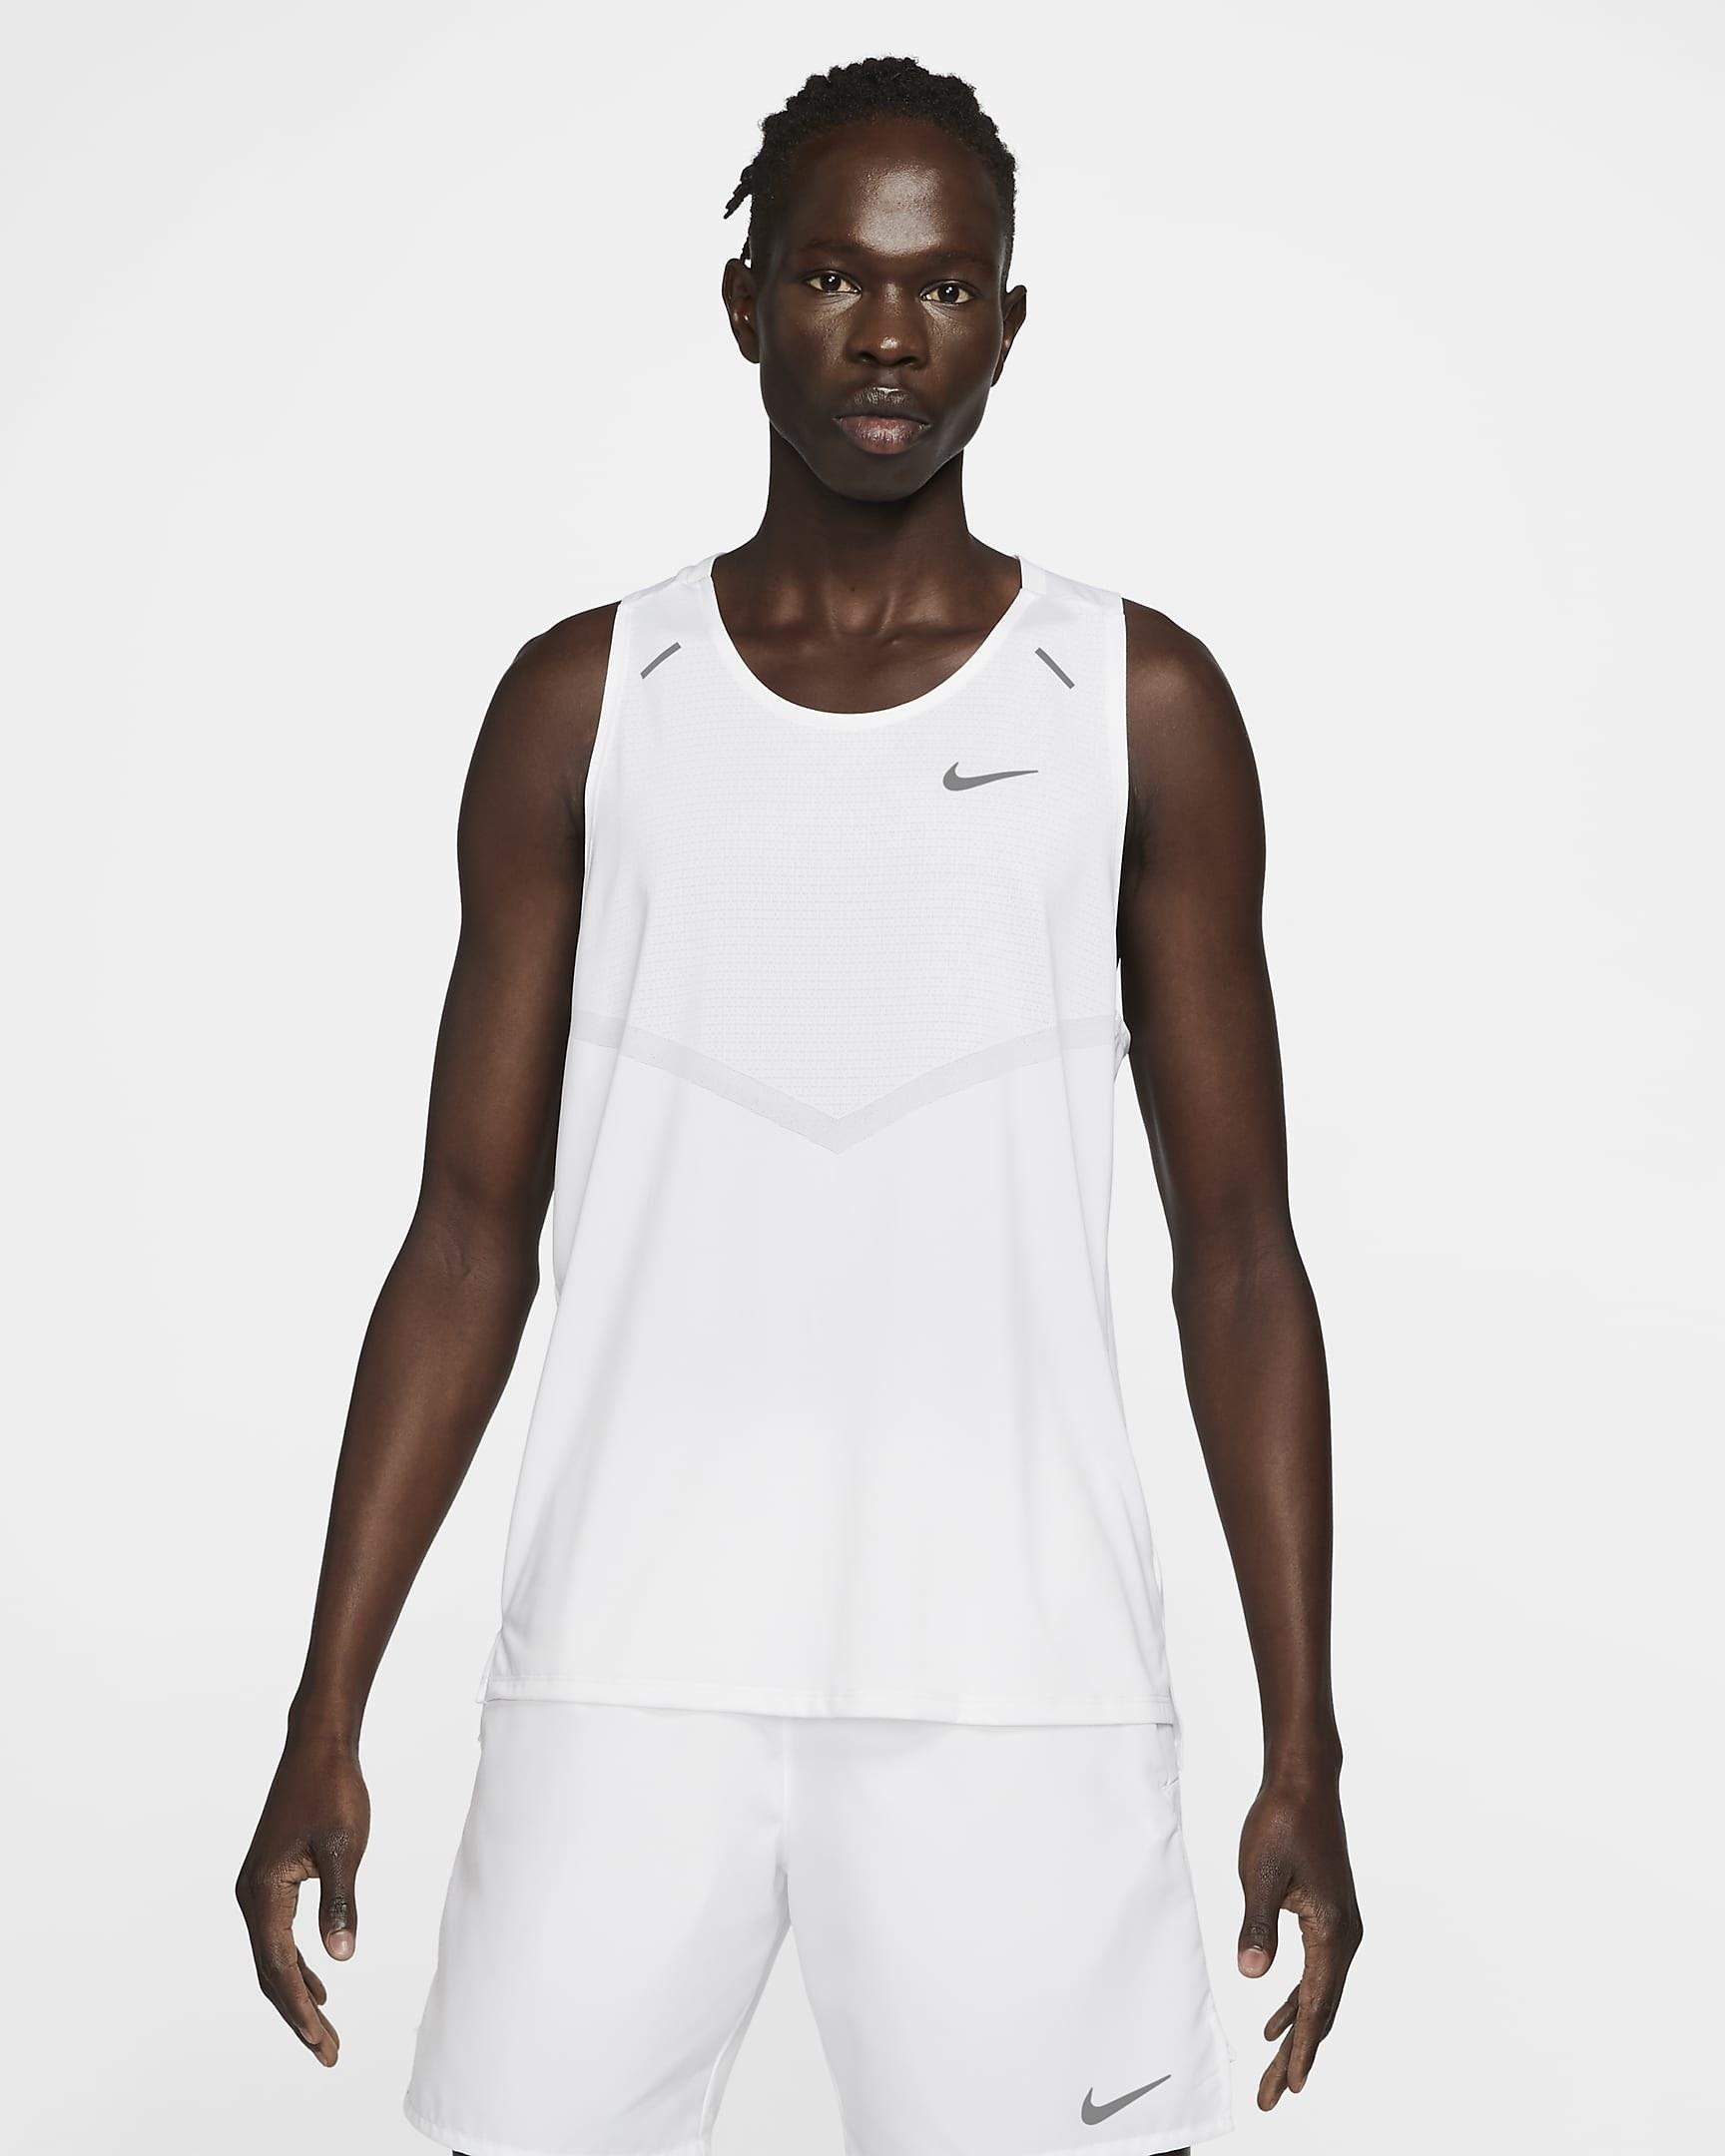 Model wearing white running tank with matching white shorts